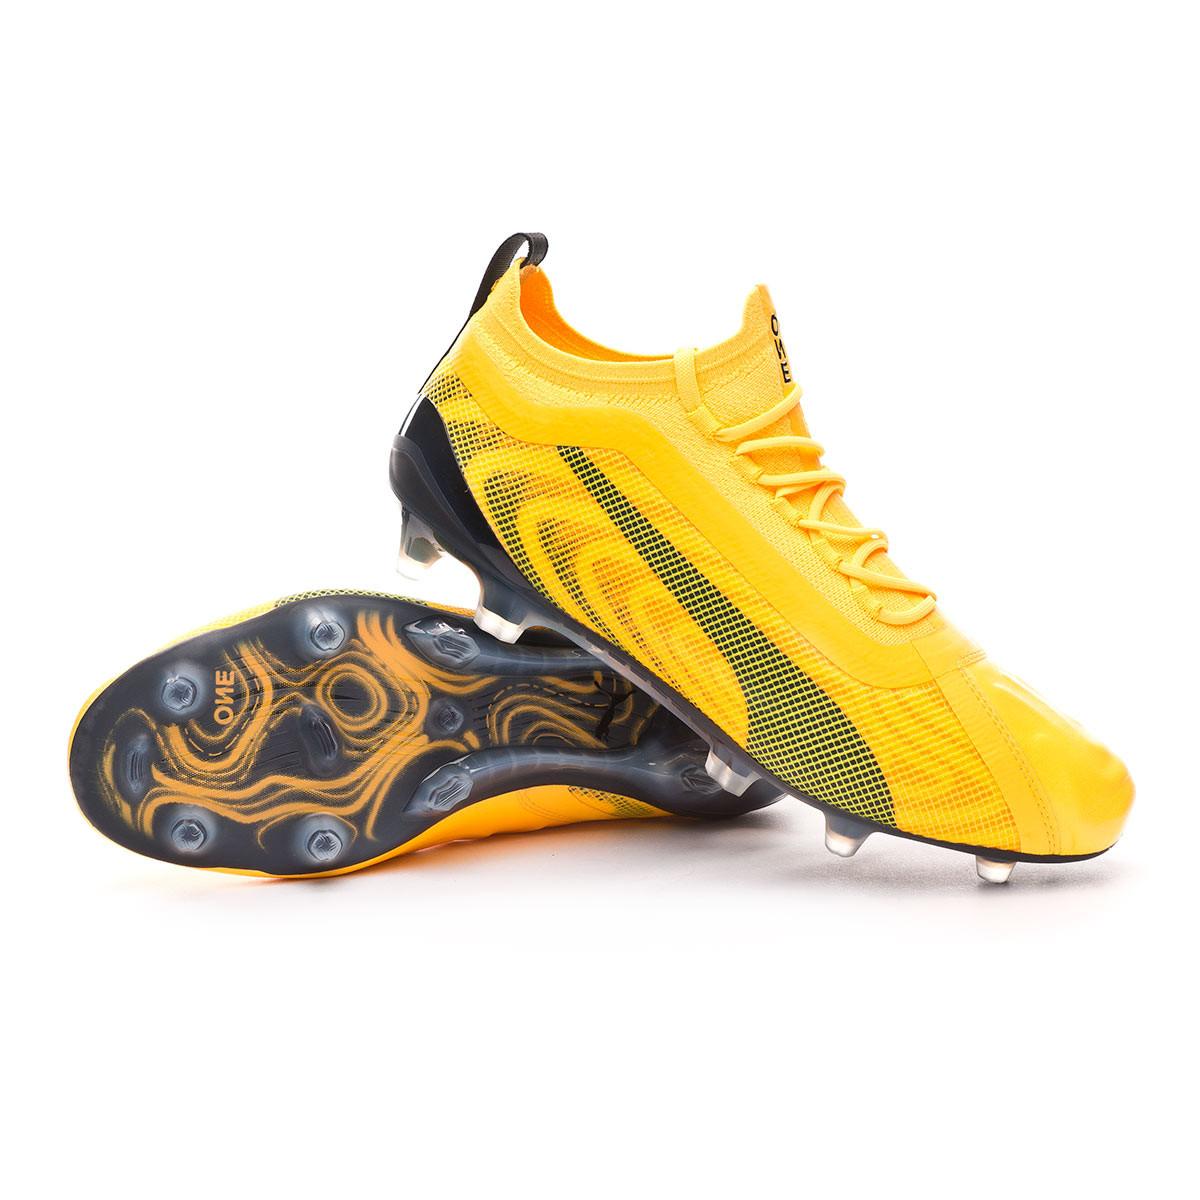 puma one 1 scarpe